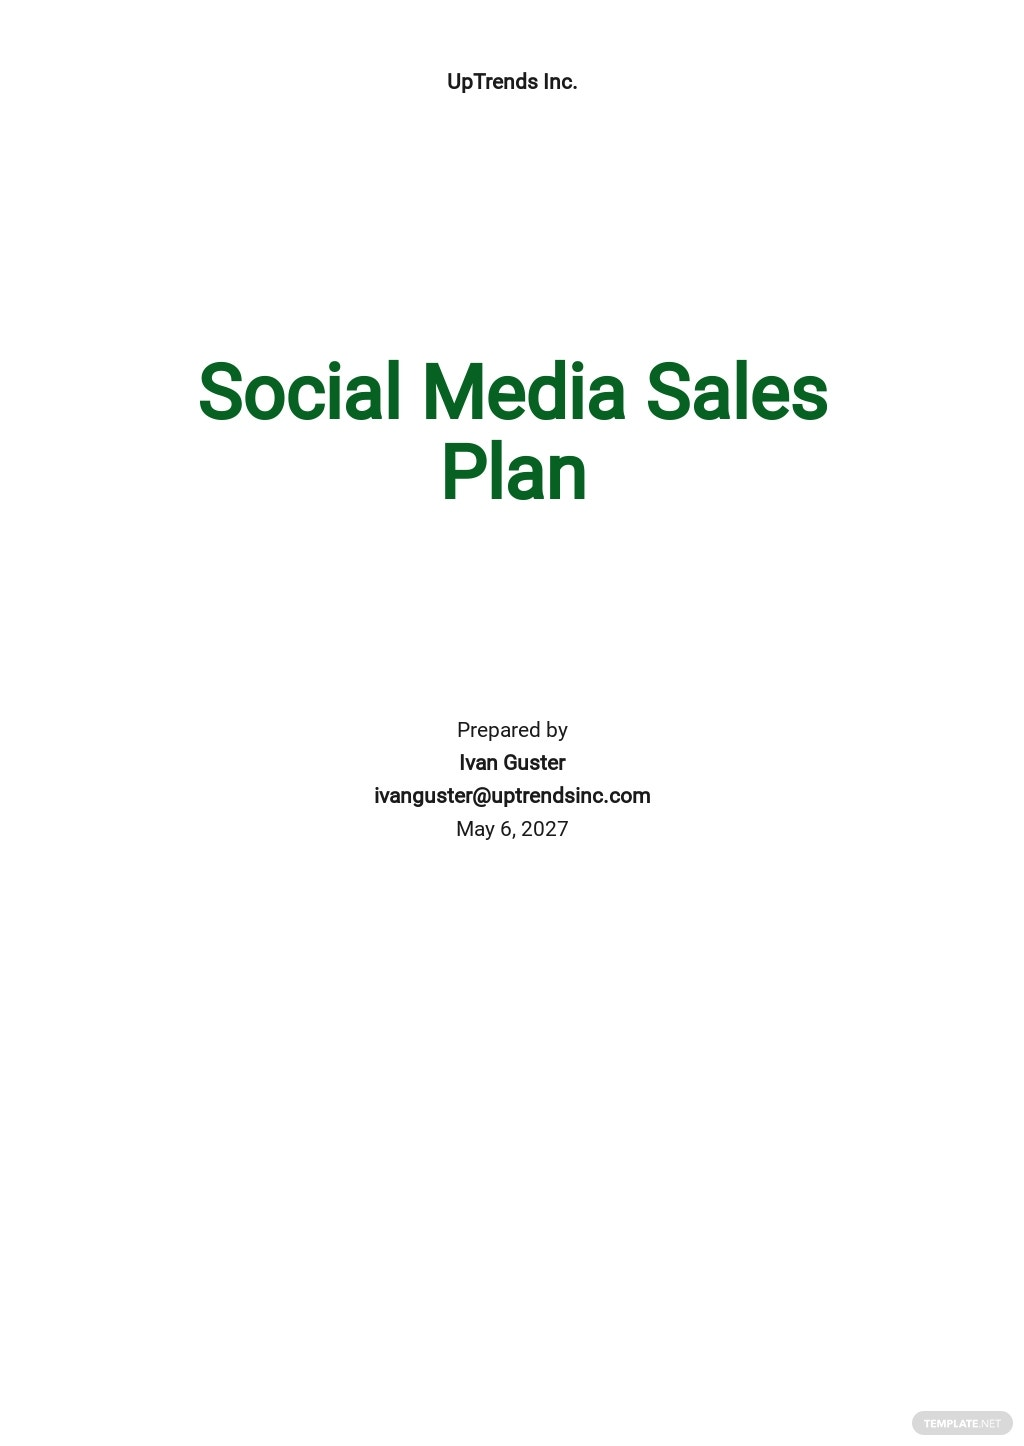 Social Media Sales Plan Template